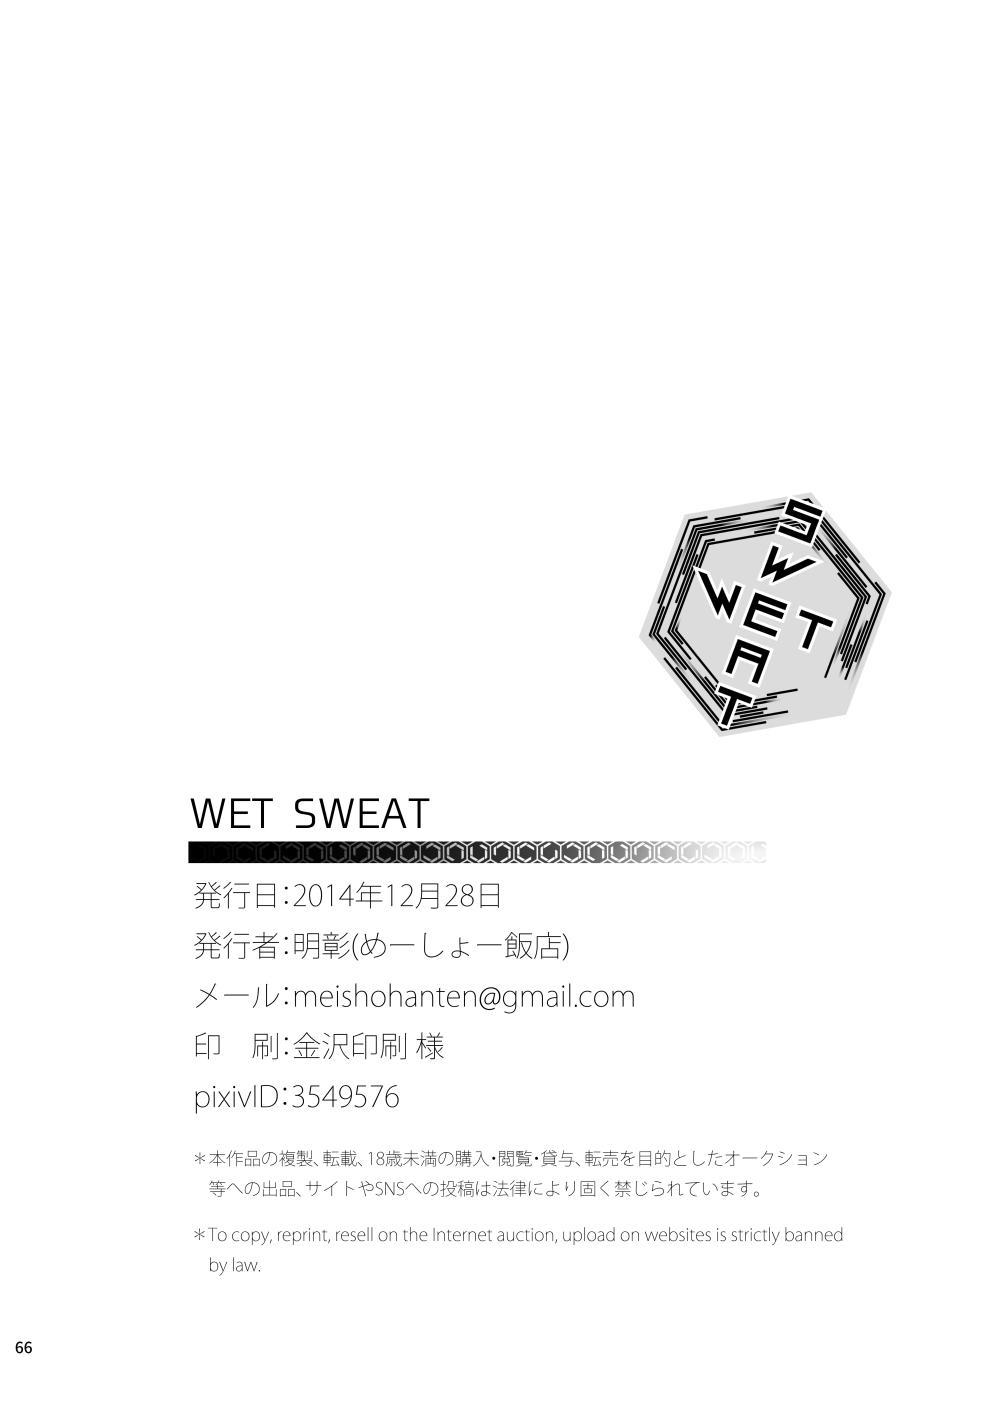 WET SWEAT 66